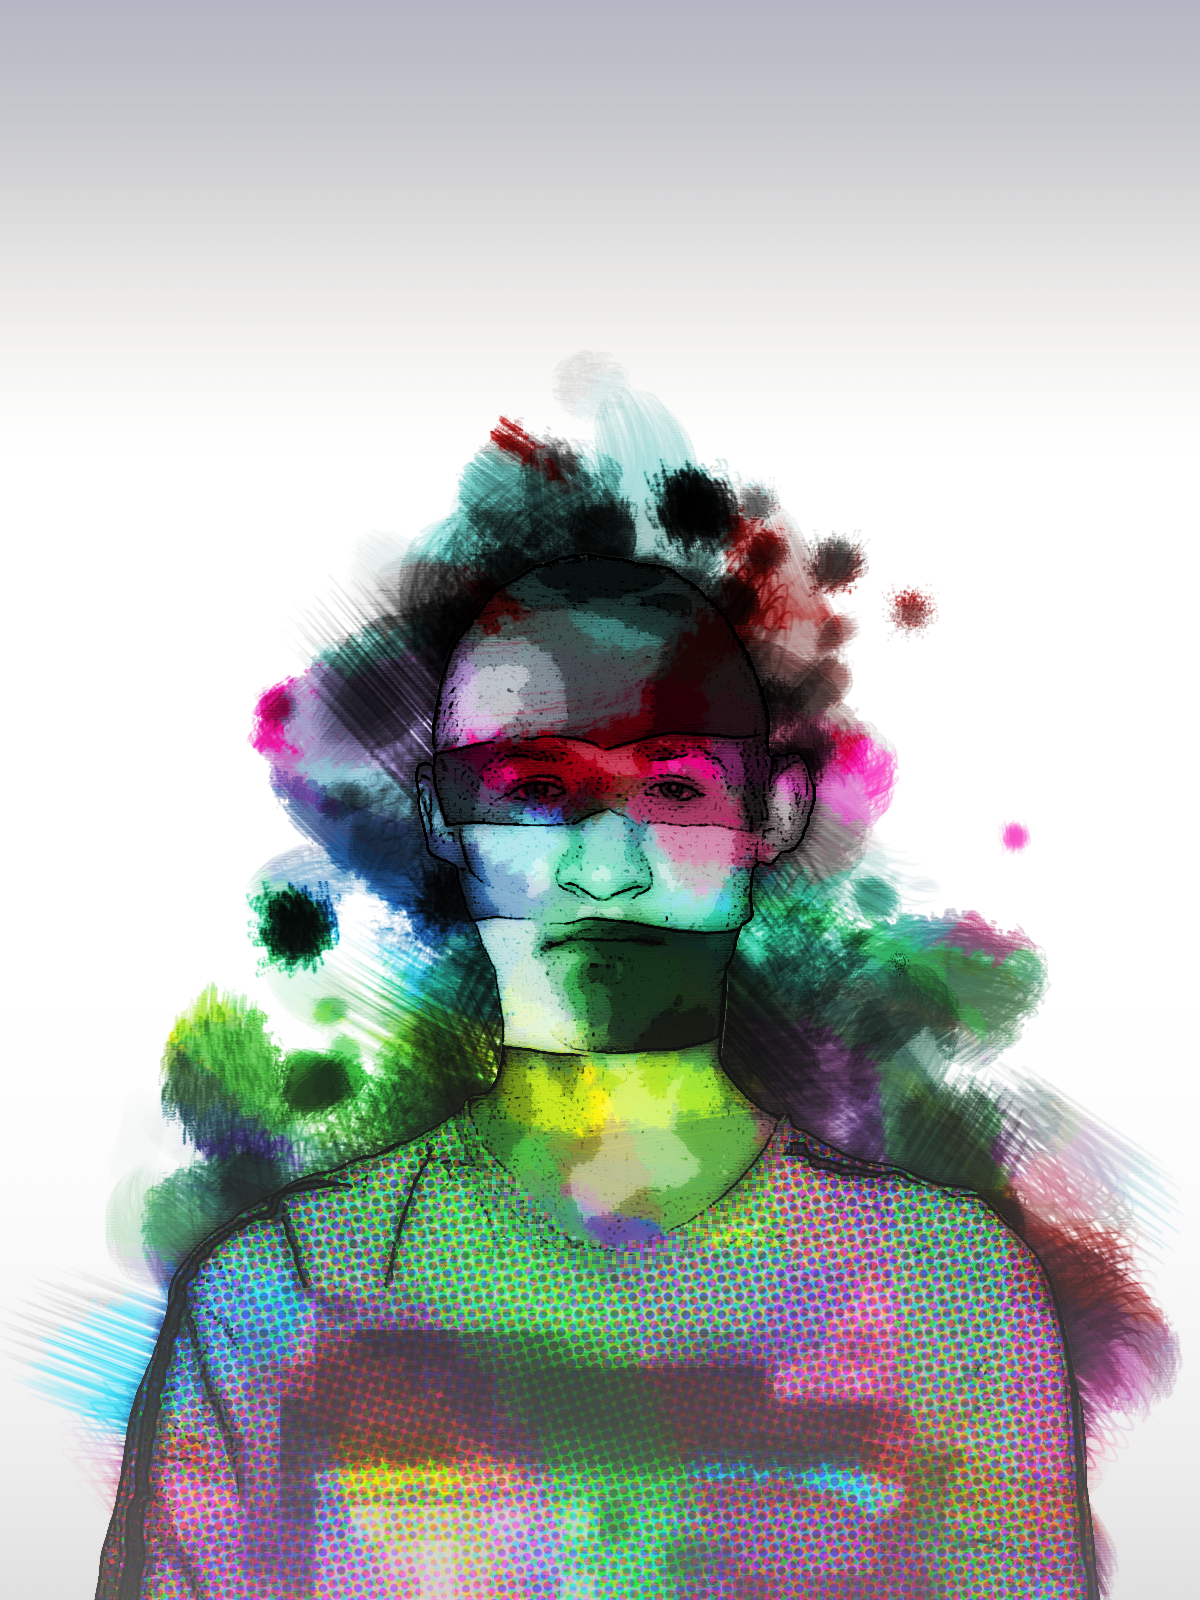 Digital Auto-Portrait